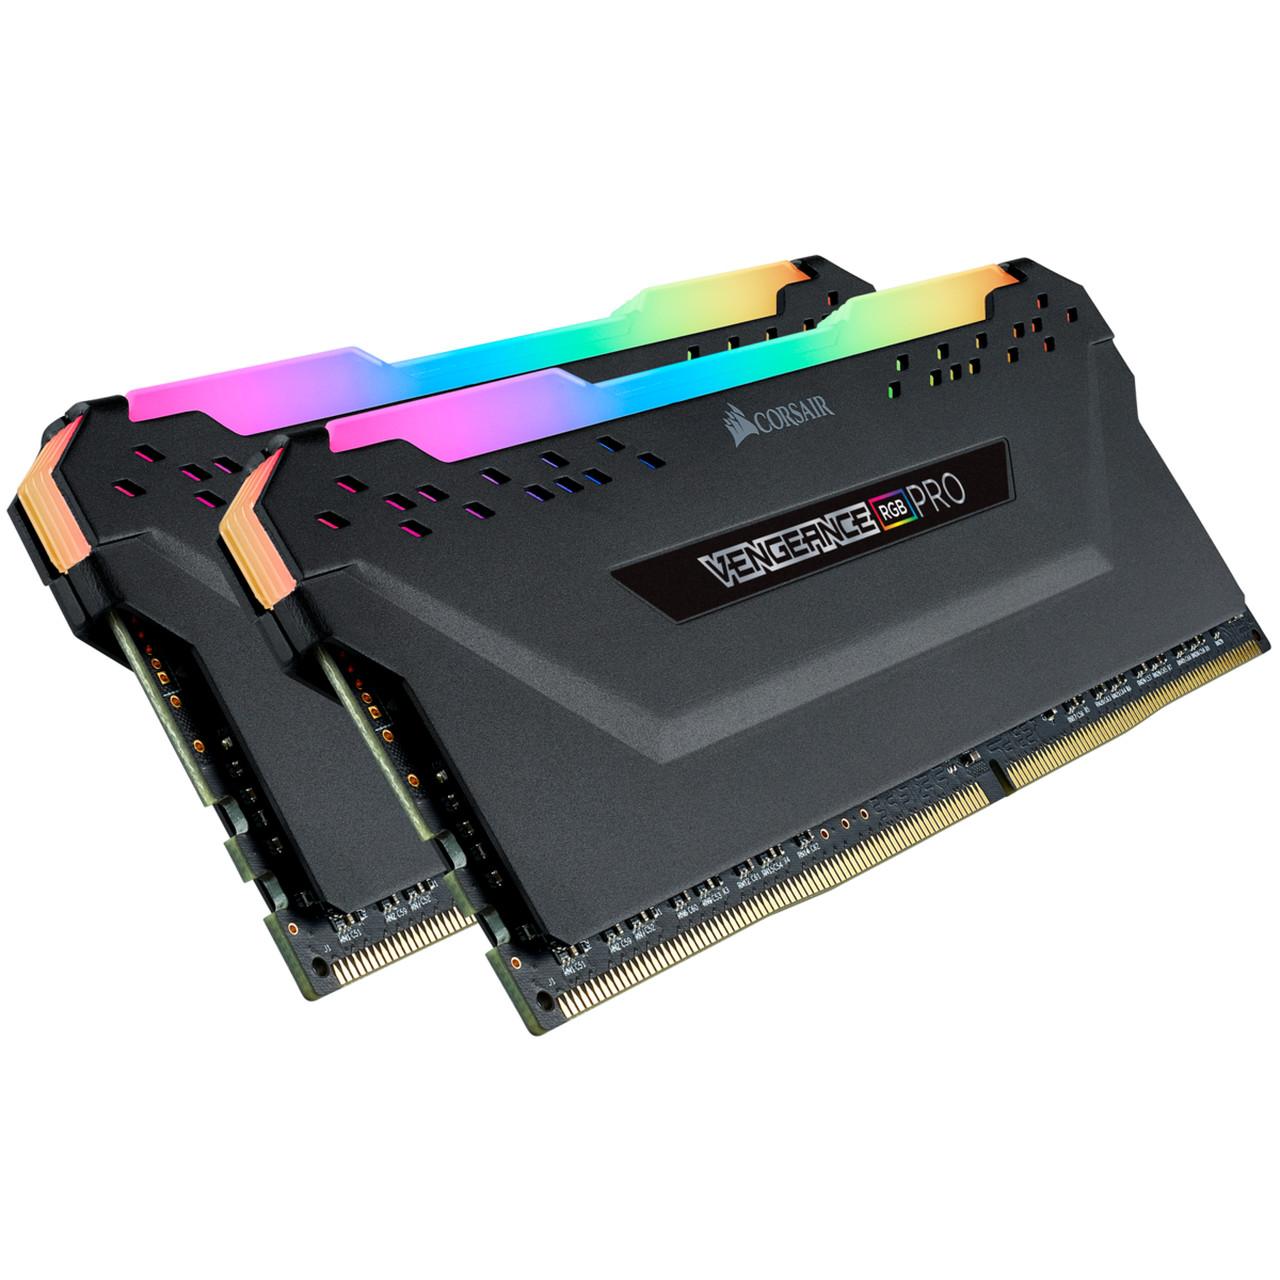 Memoria Corsair Vengeance RGB PRO 16GB (2x8) DDR4 2666Mhz - CMW16GX4M2A2666C16